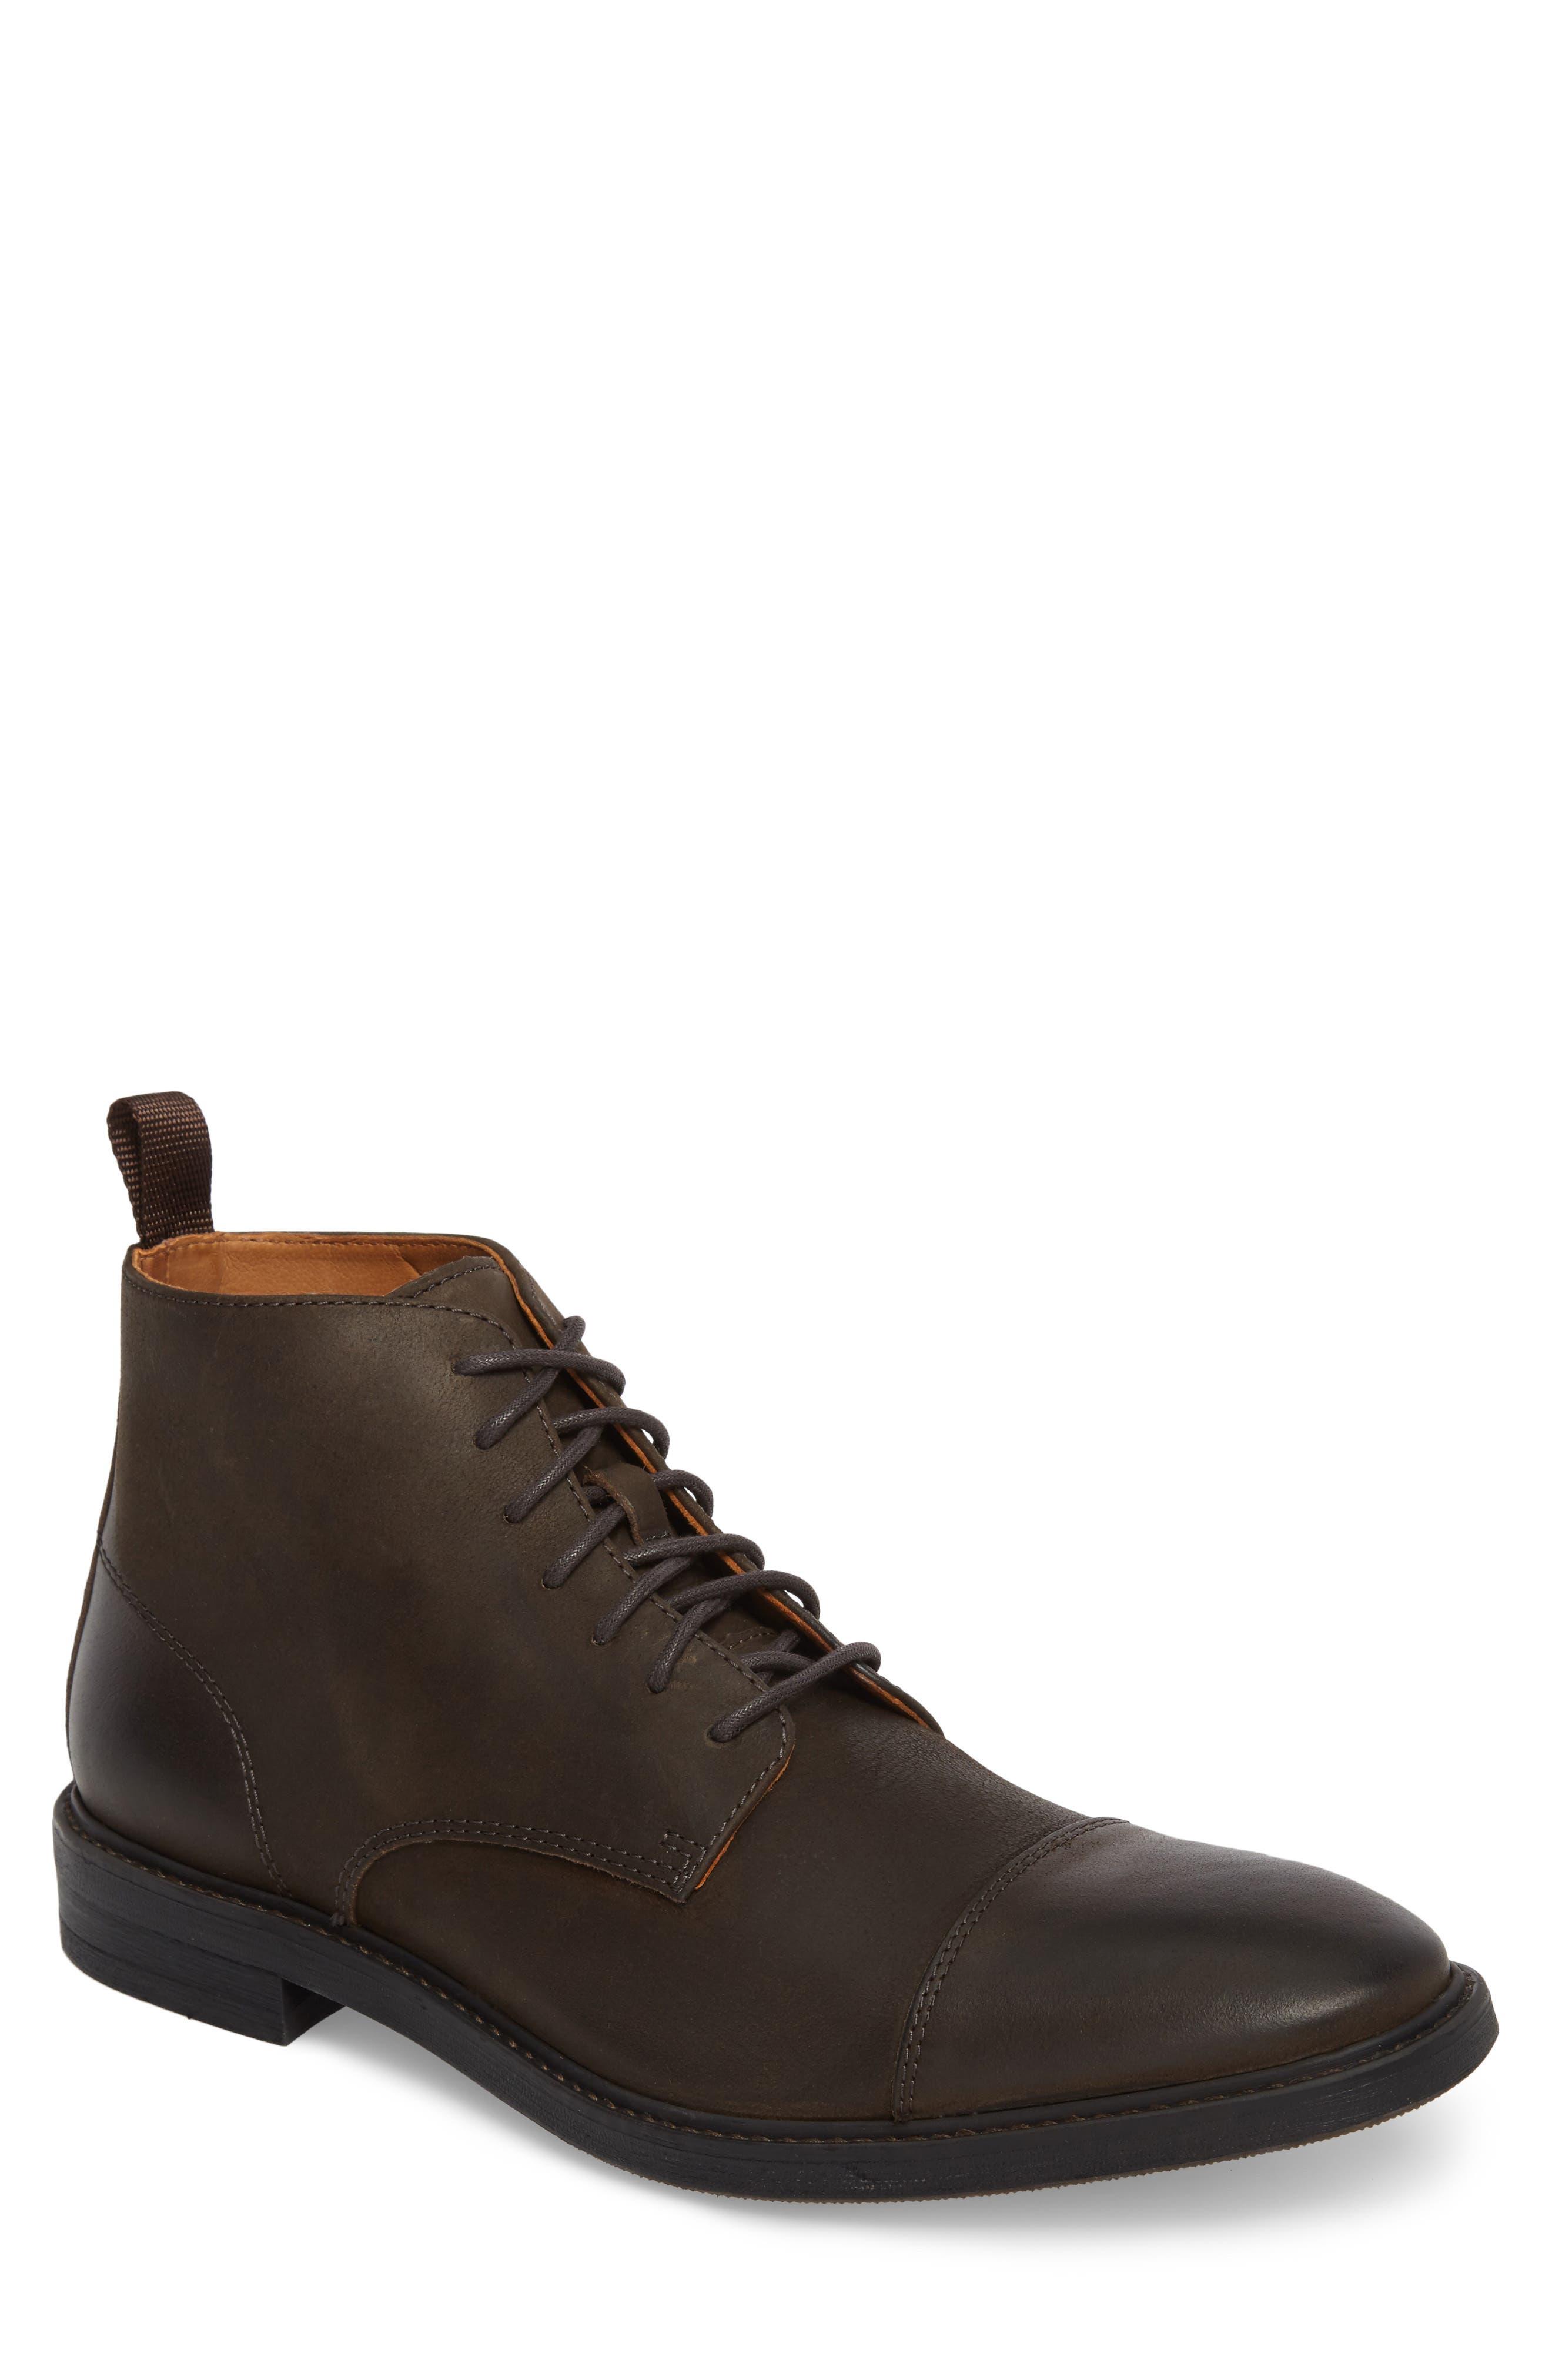 Pateros Cap Toe Boot,                         Main,                         color,